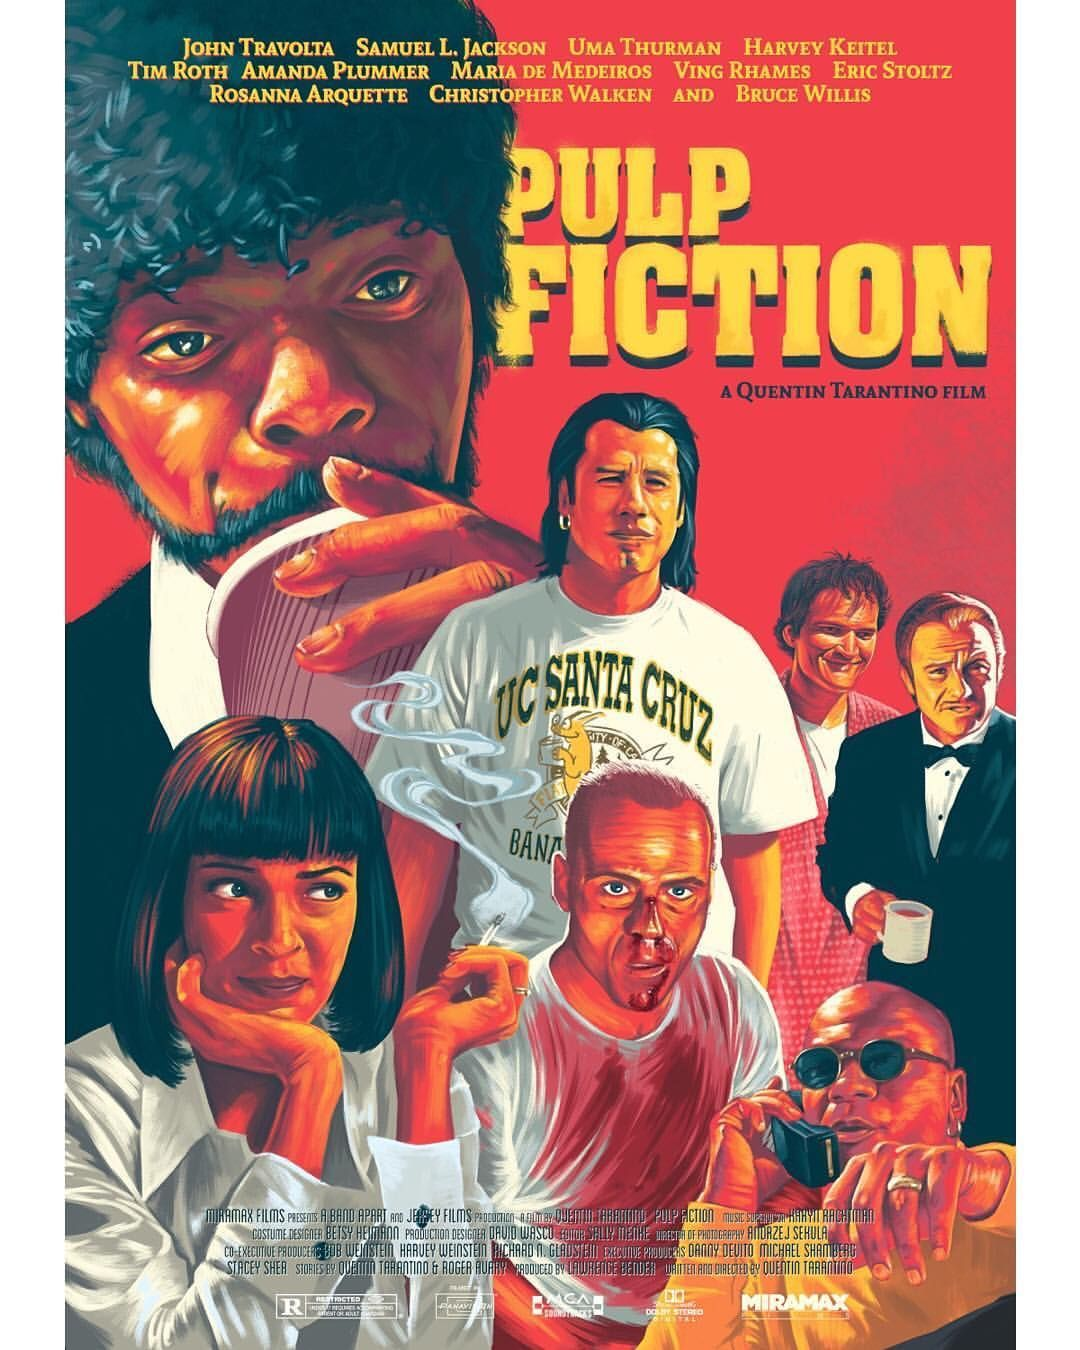 Pulp Fiction 1994 1080x1350 Posteres De Filmes Antigos Cartazes De Filmes Classicos Cartazes De Filmes Antigos